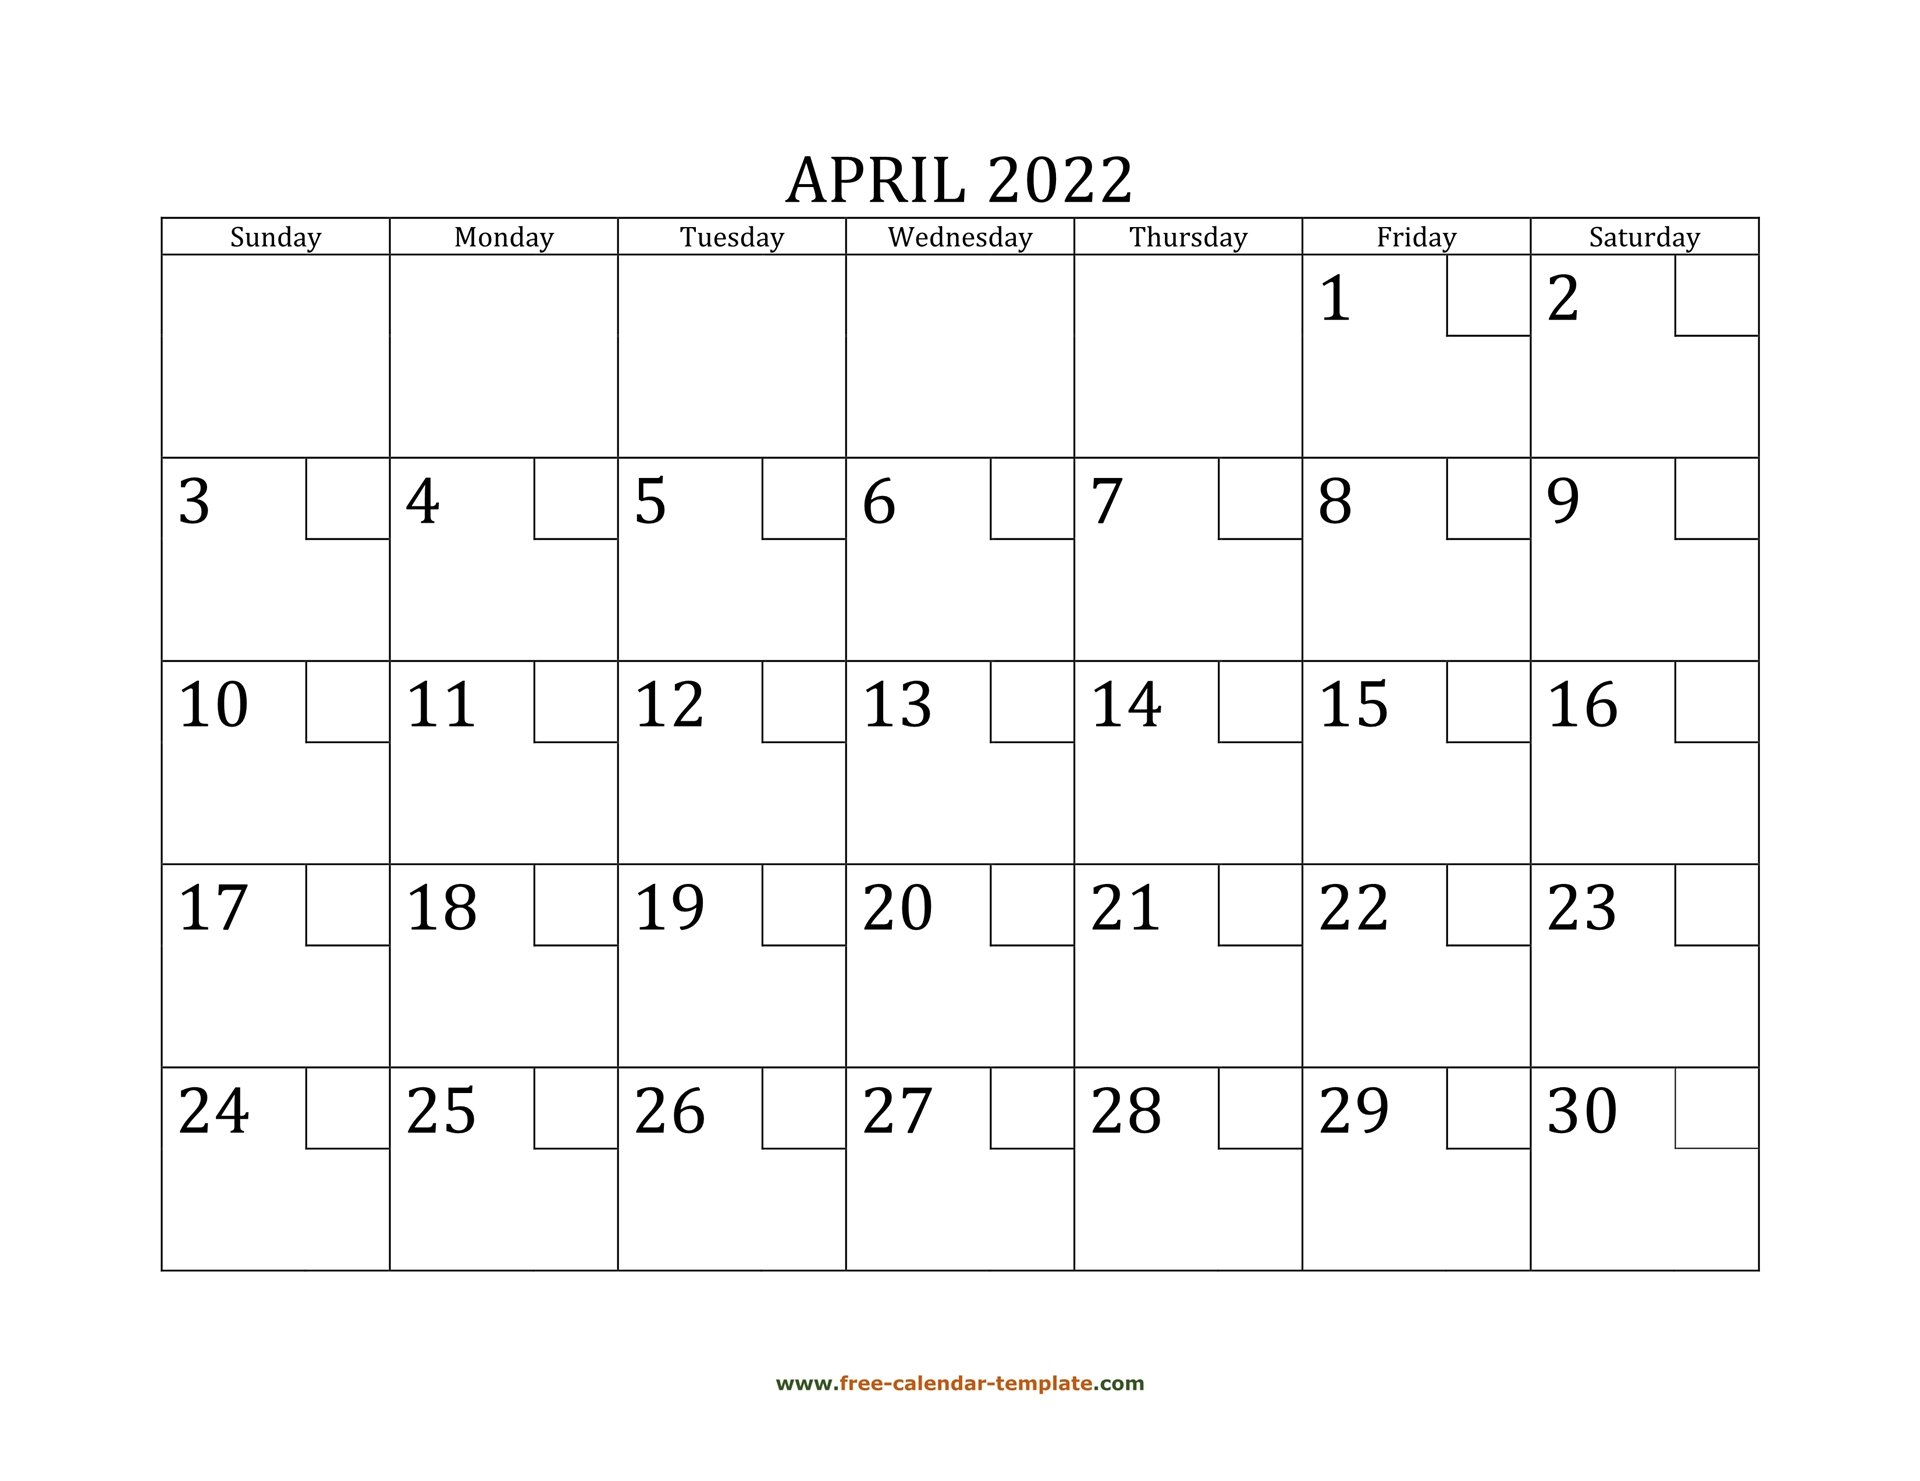 April 2022 Free Calendar Tempplate | Free-Calendar in April May Calendar 2022 Pdf